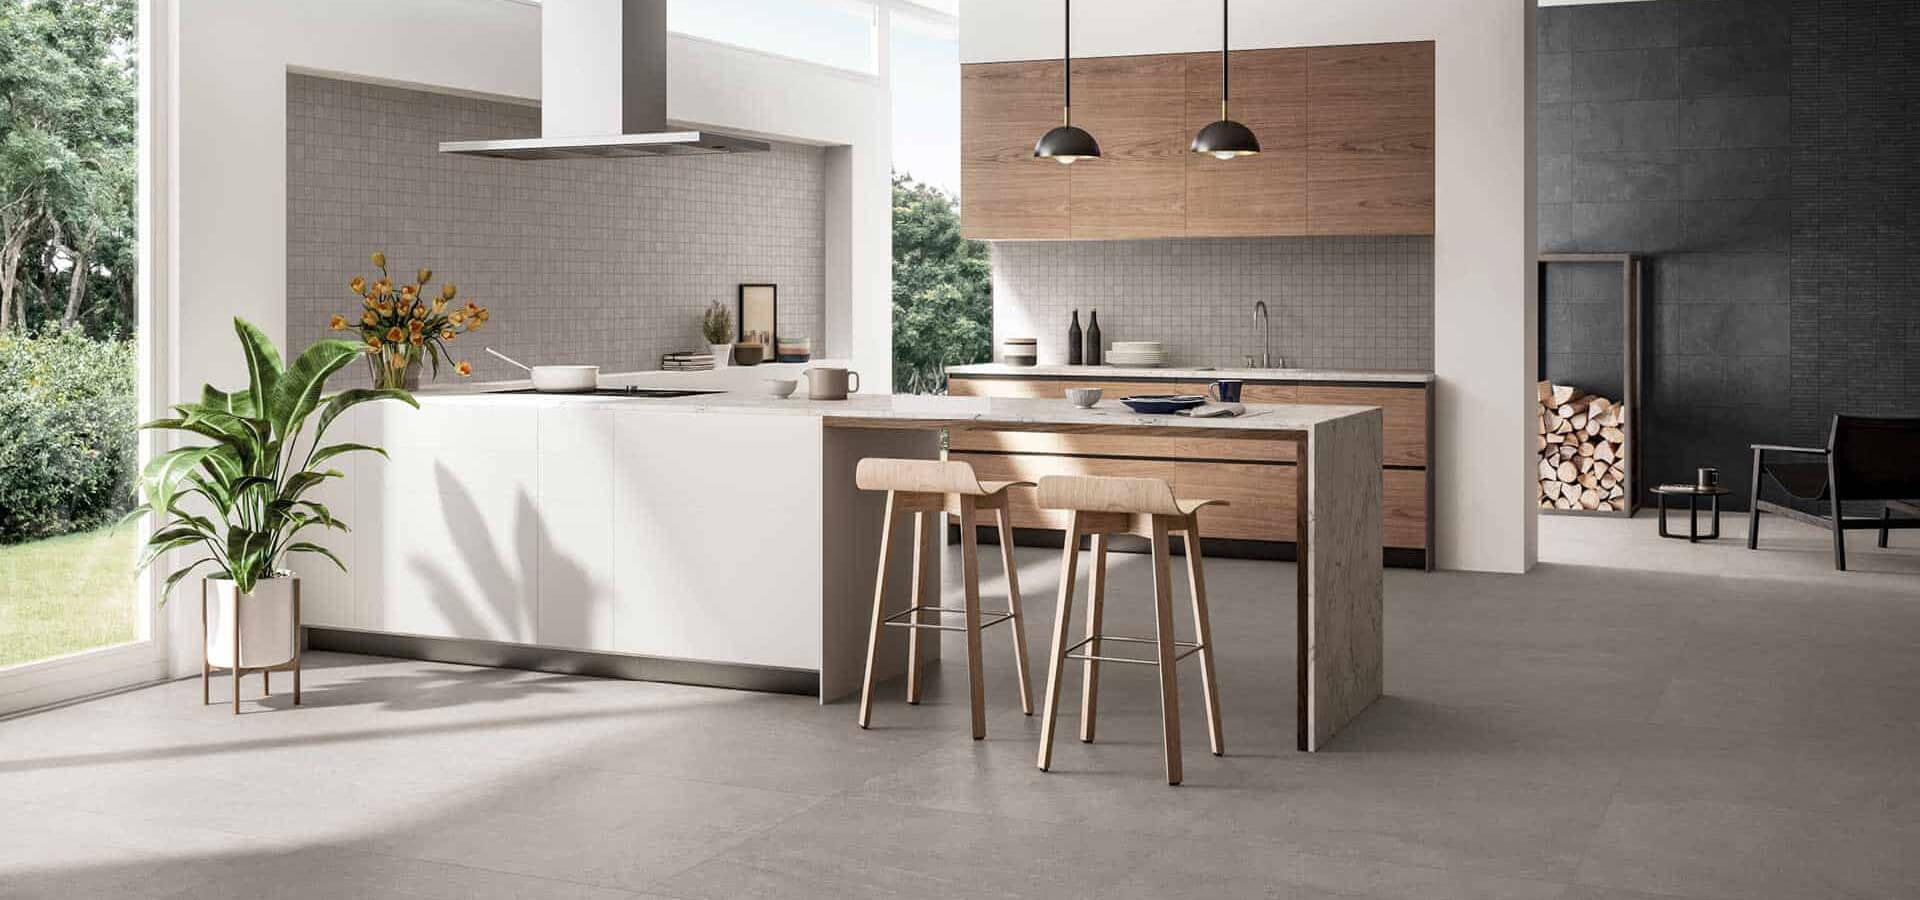 Cerbis Ceramics SA kitchen tiles